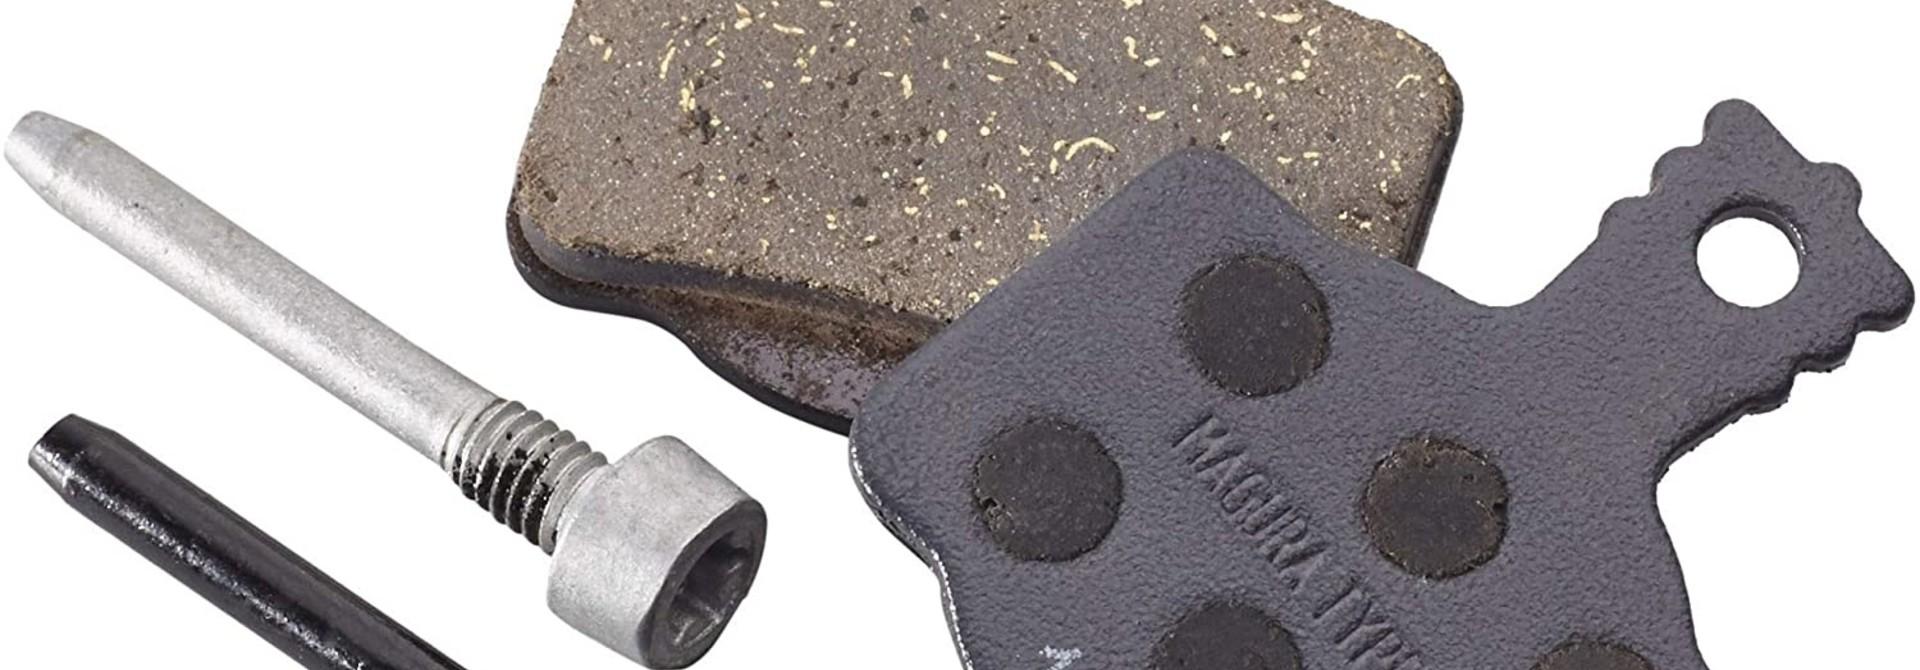 Magura 7.P Performance Disc Brake Pads (MT & MT Next)